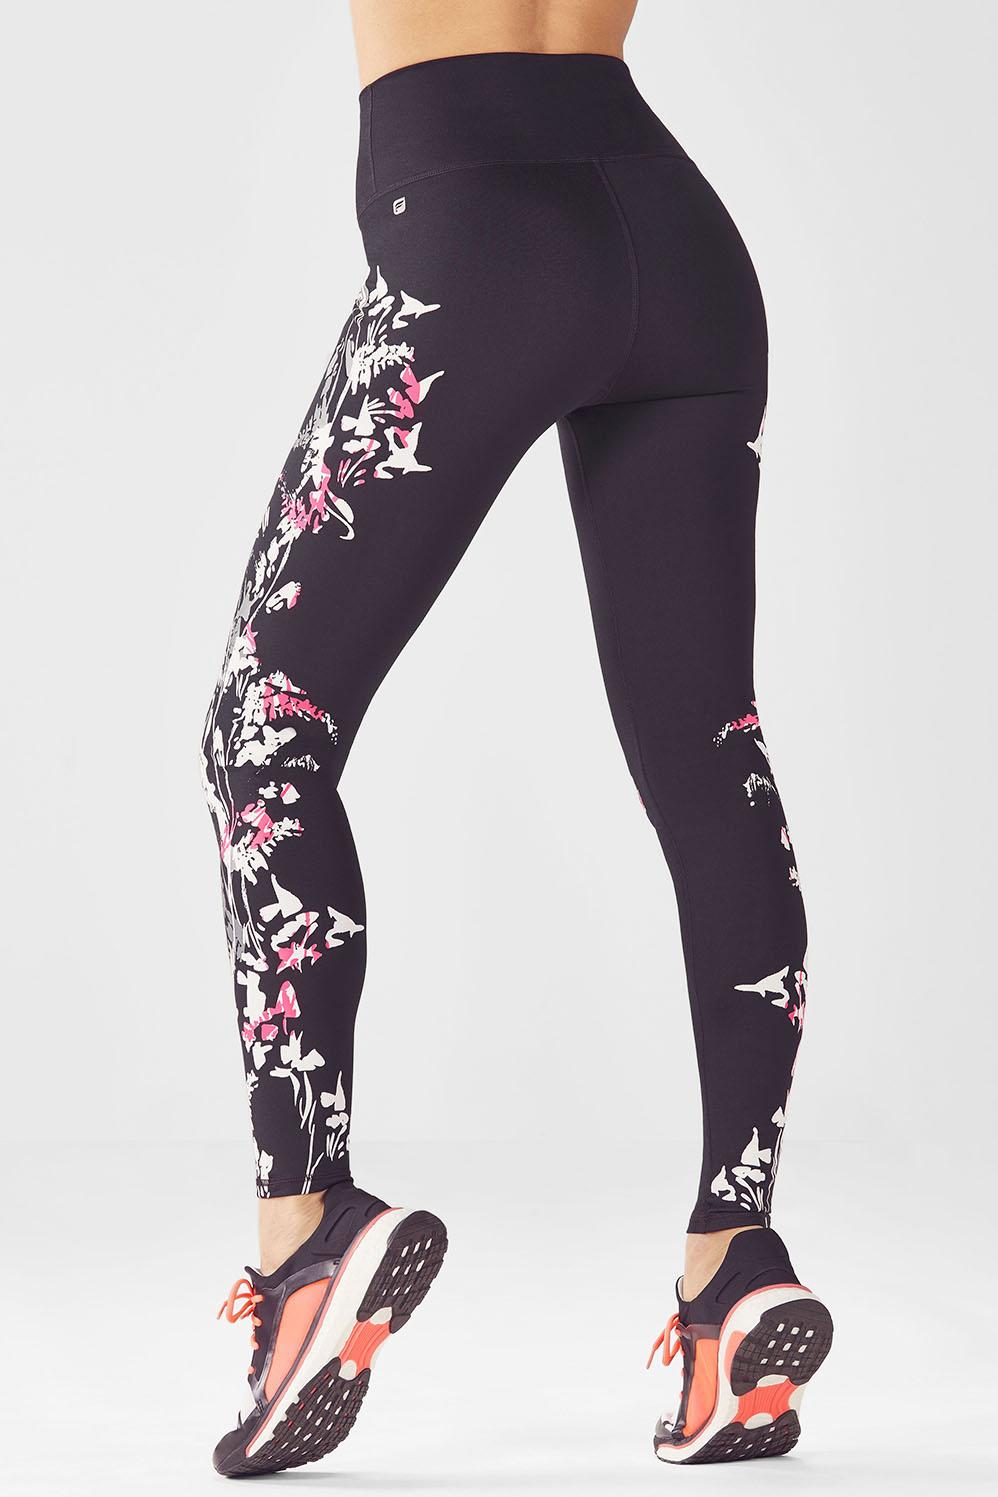 fedf2799a3307 High-Waisted Printed PowerHold® Legging - Pop Coral Pretty Punk